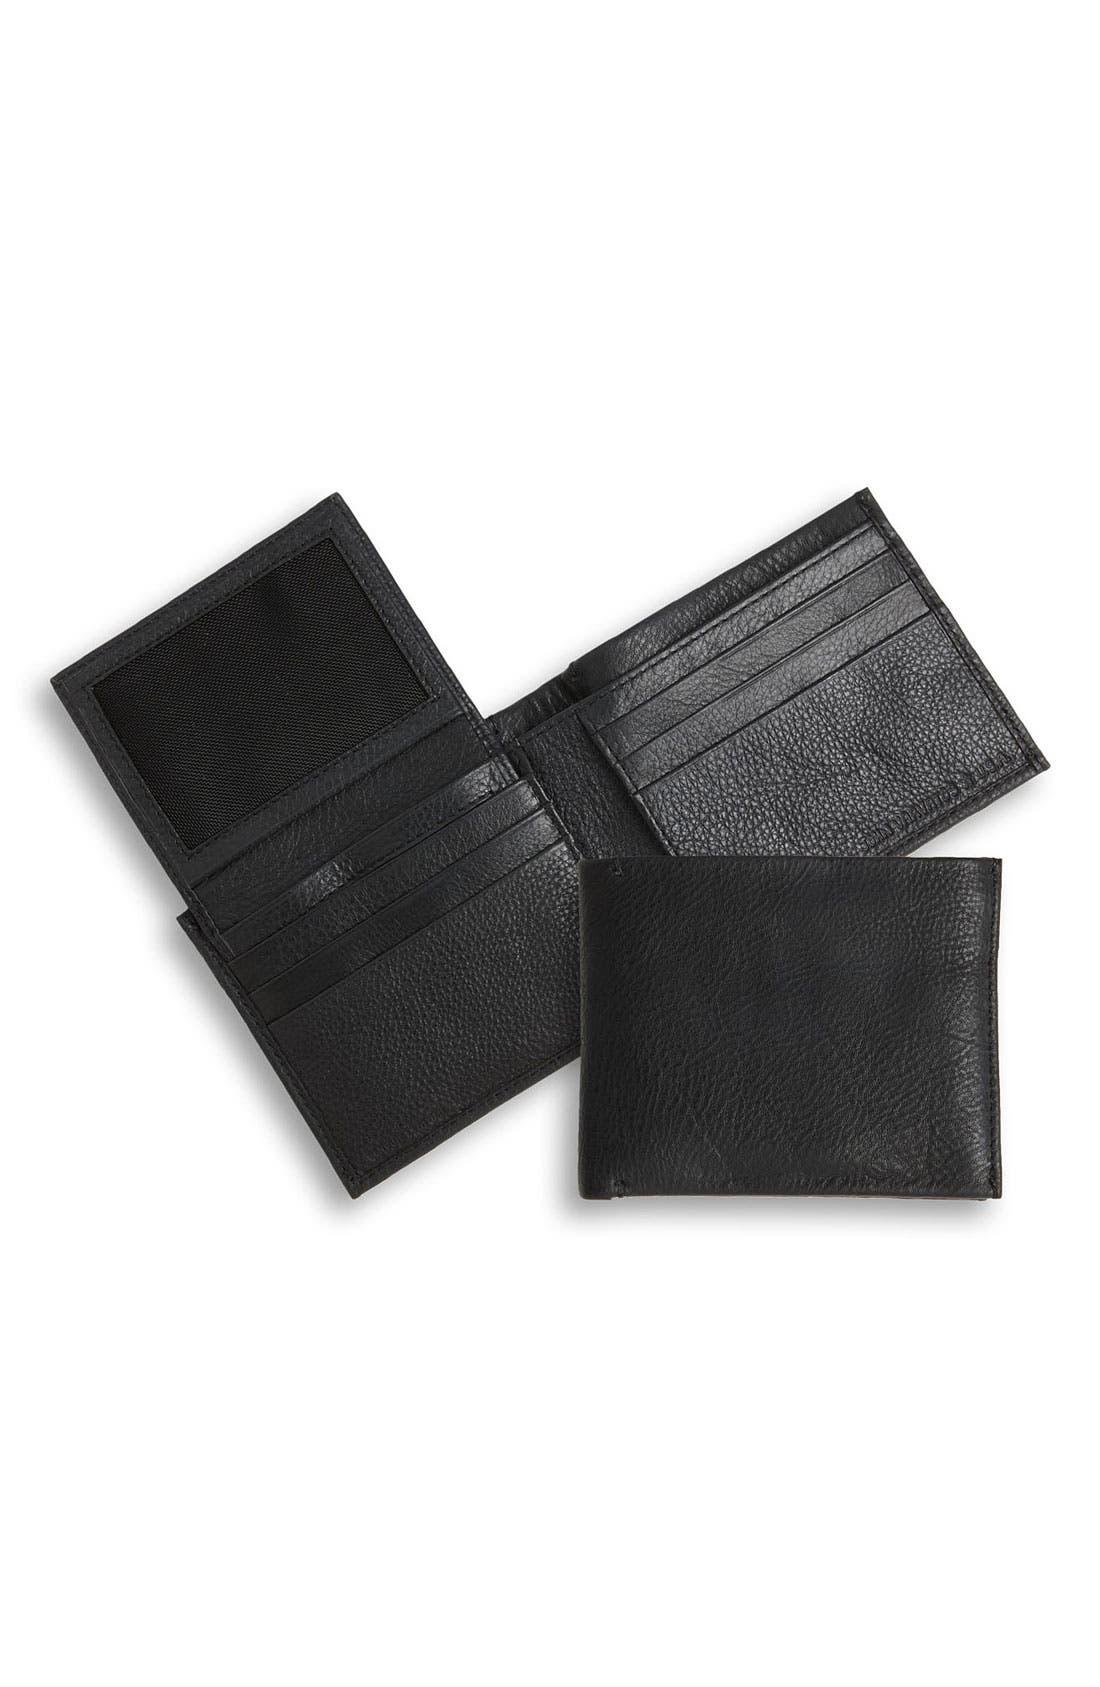 Alternate Image 1 Selected - John Varvatos Star USA ID Passcase Bifold Wallet